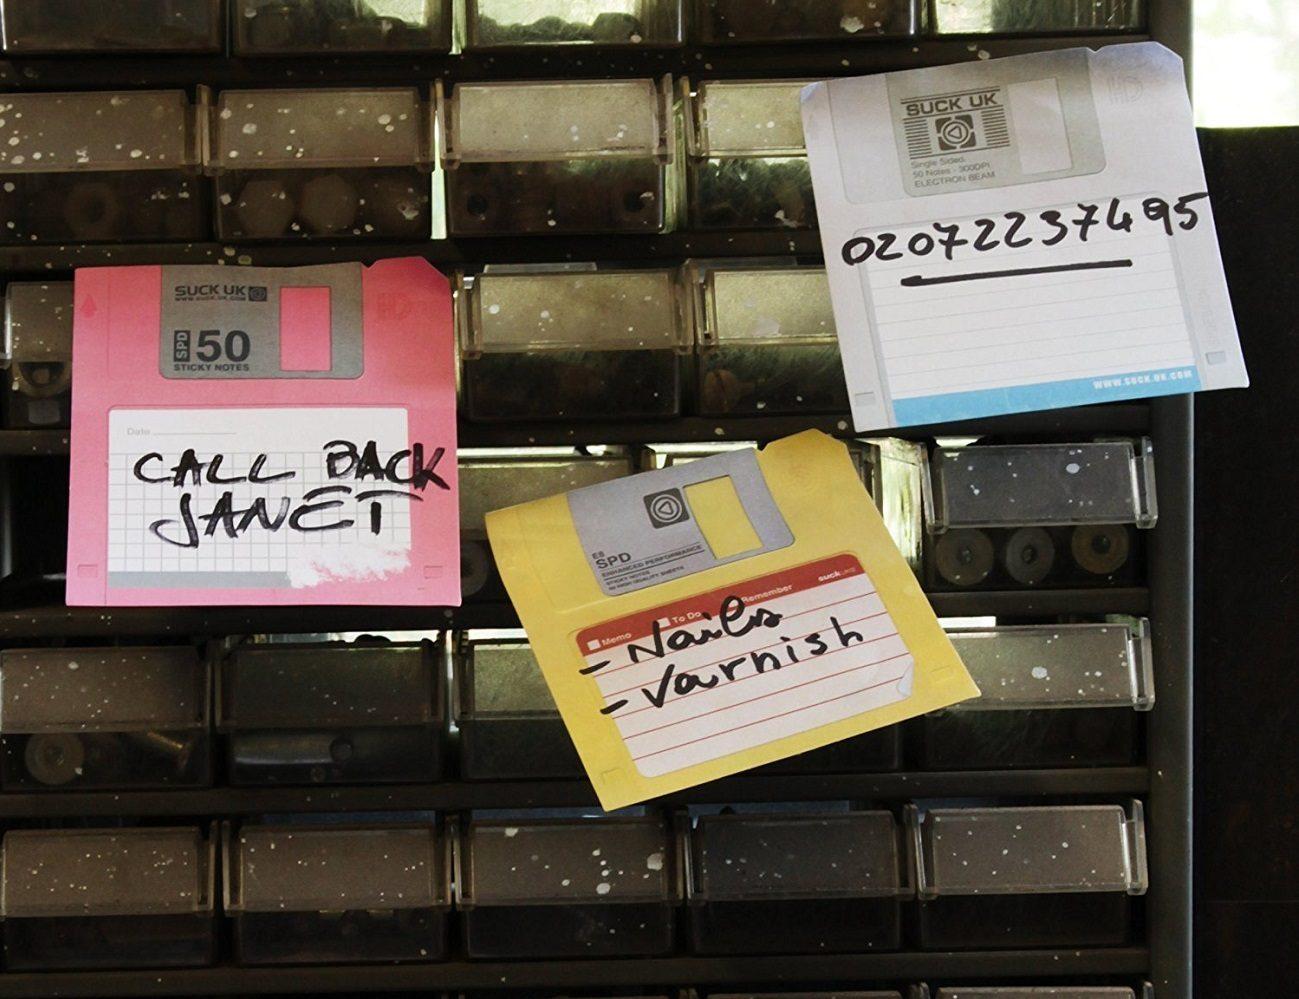 SUCK UK Floppy Disk Sticky Notes